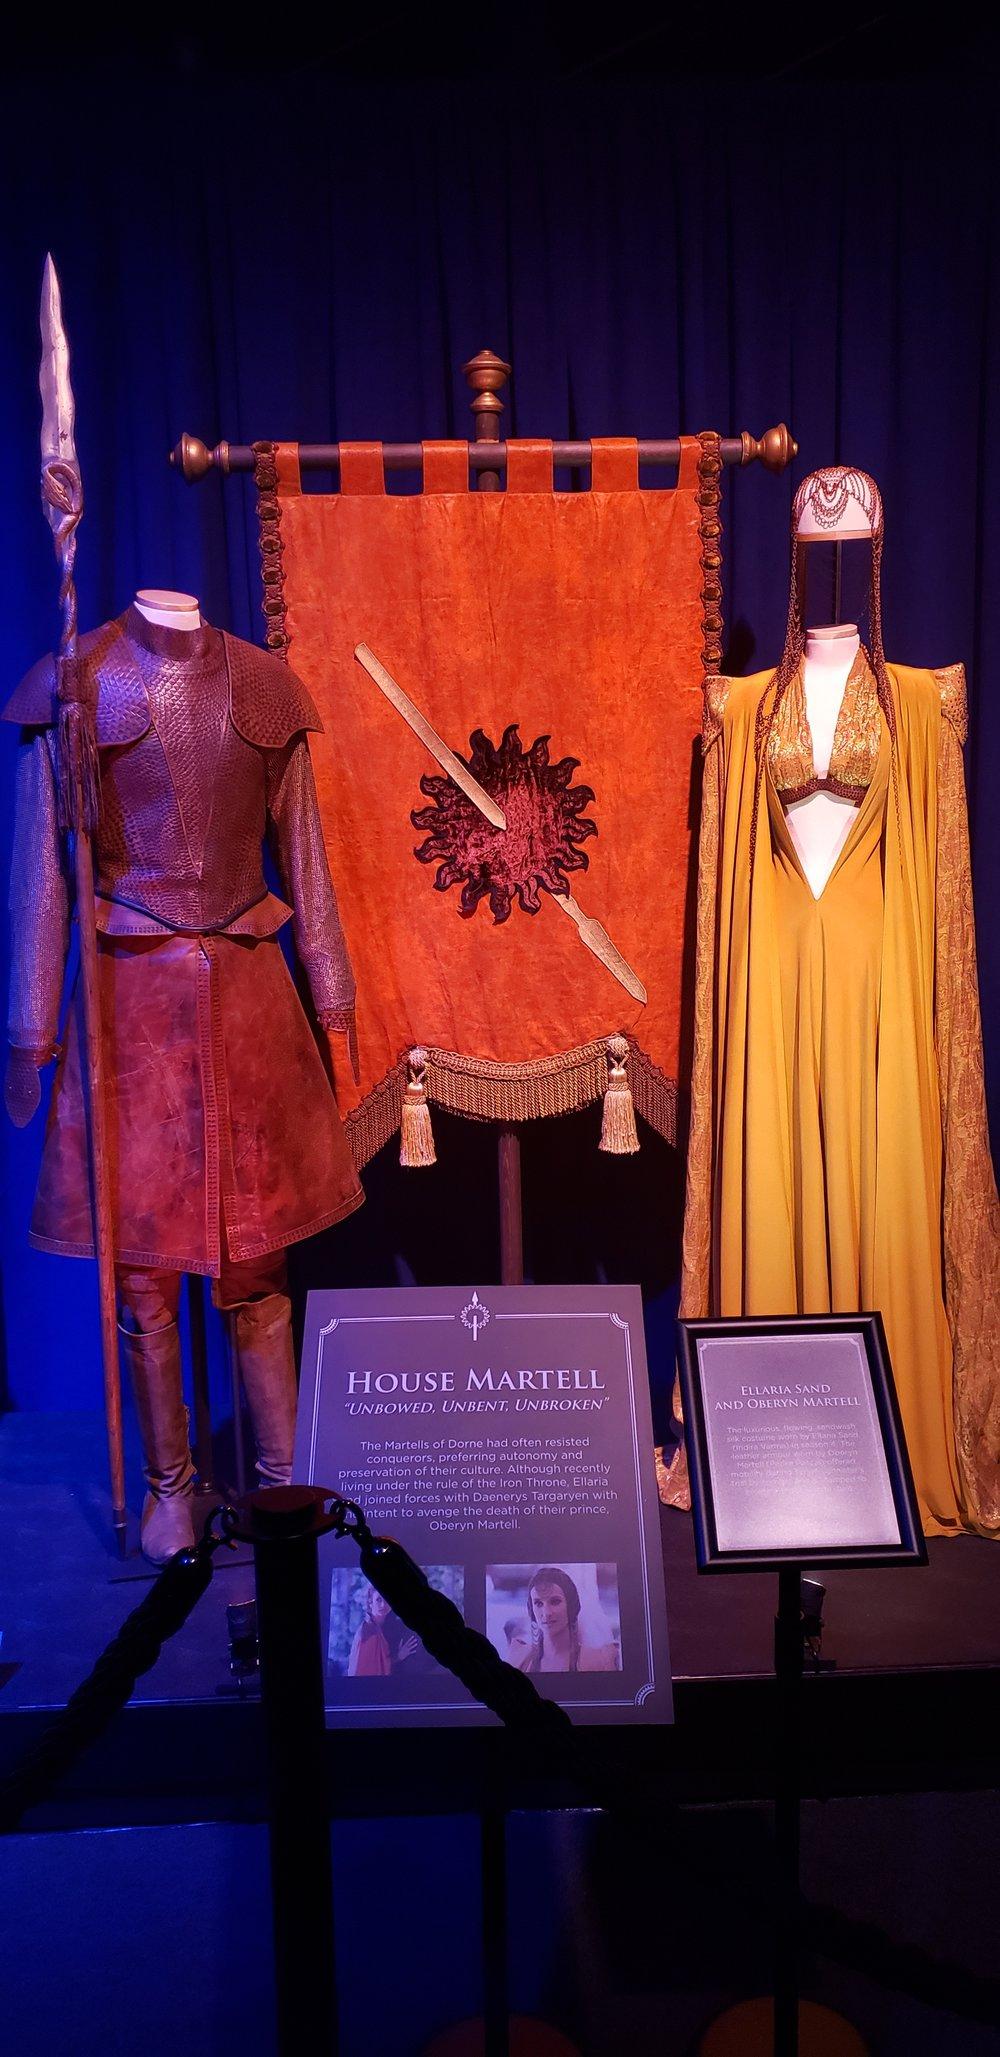 Oberyn Martell and Ellaria Sand's costumes